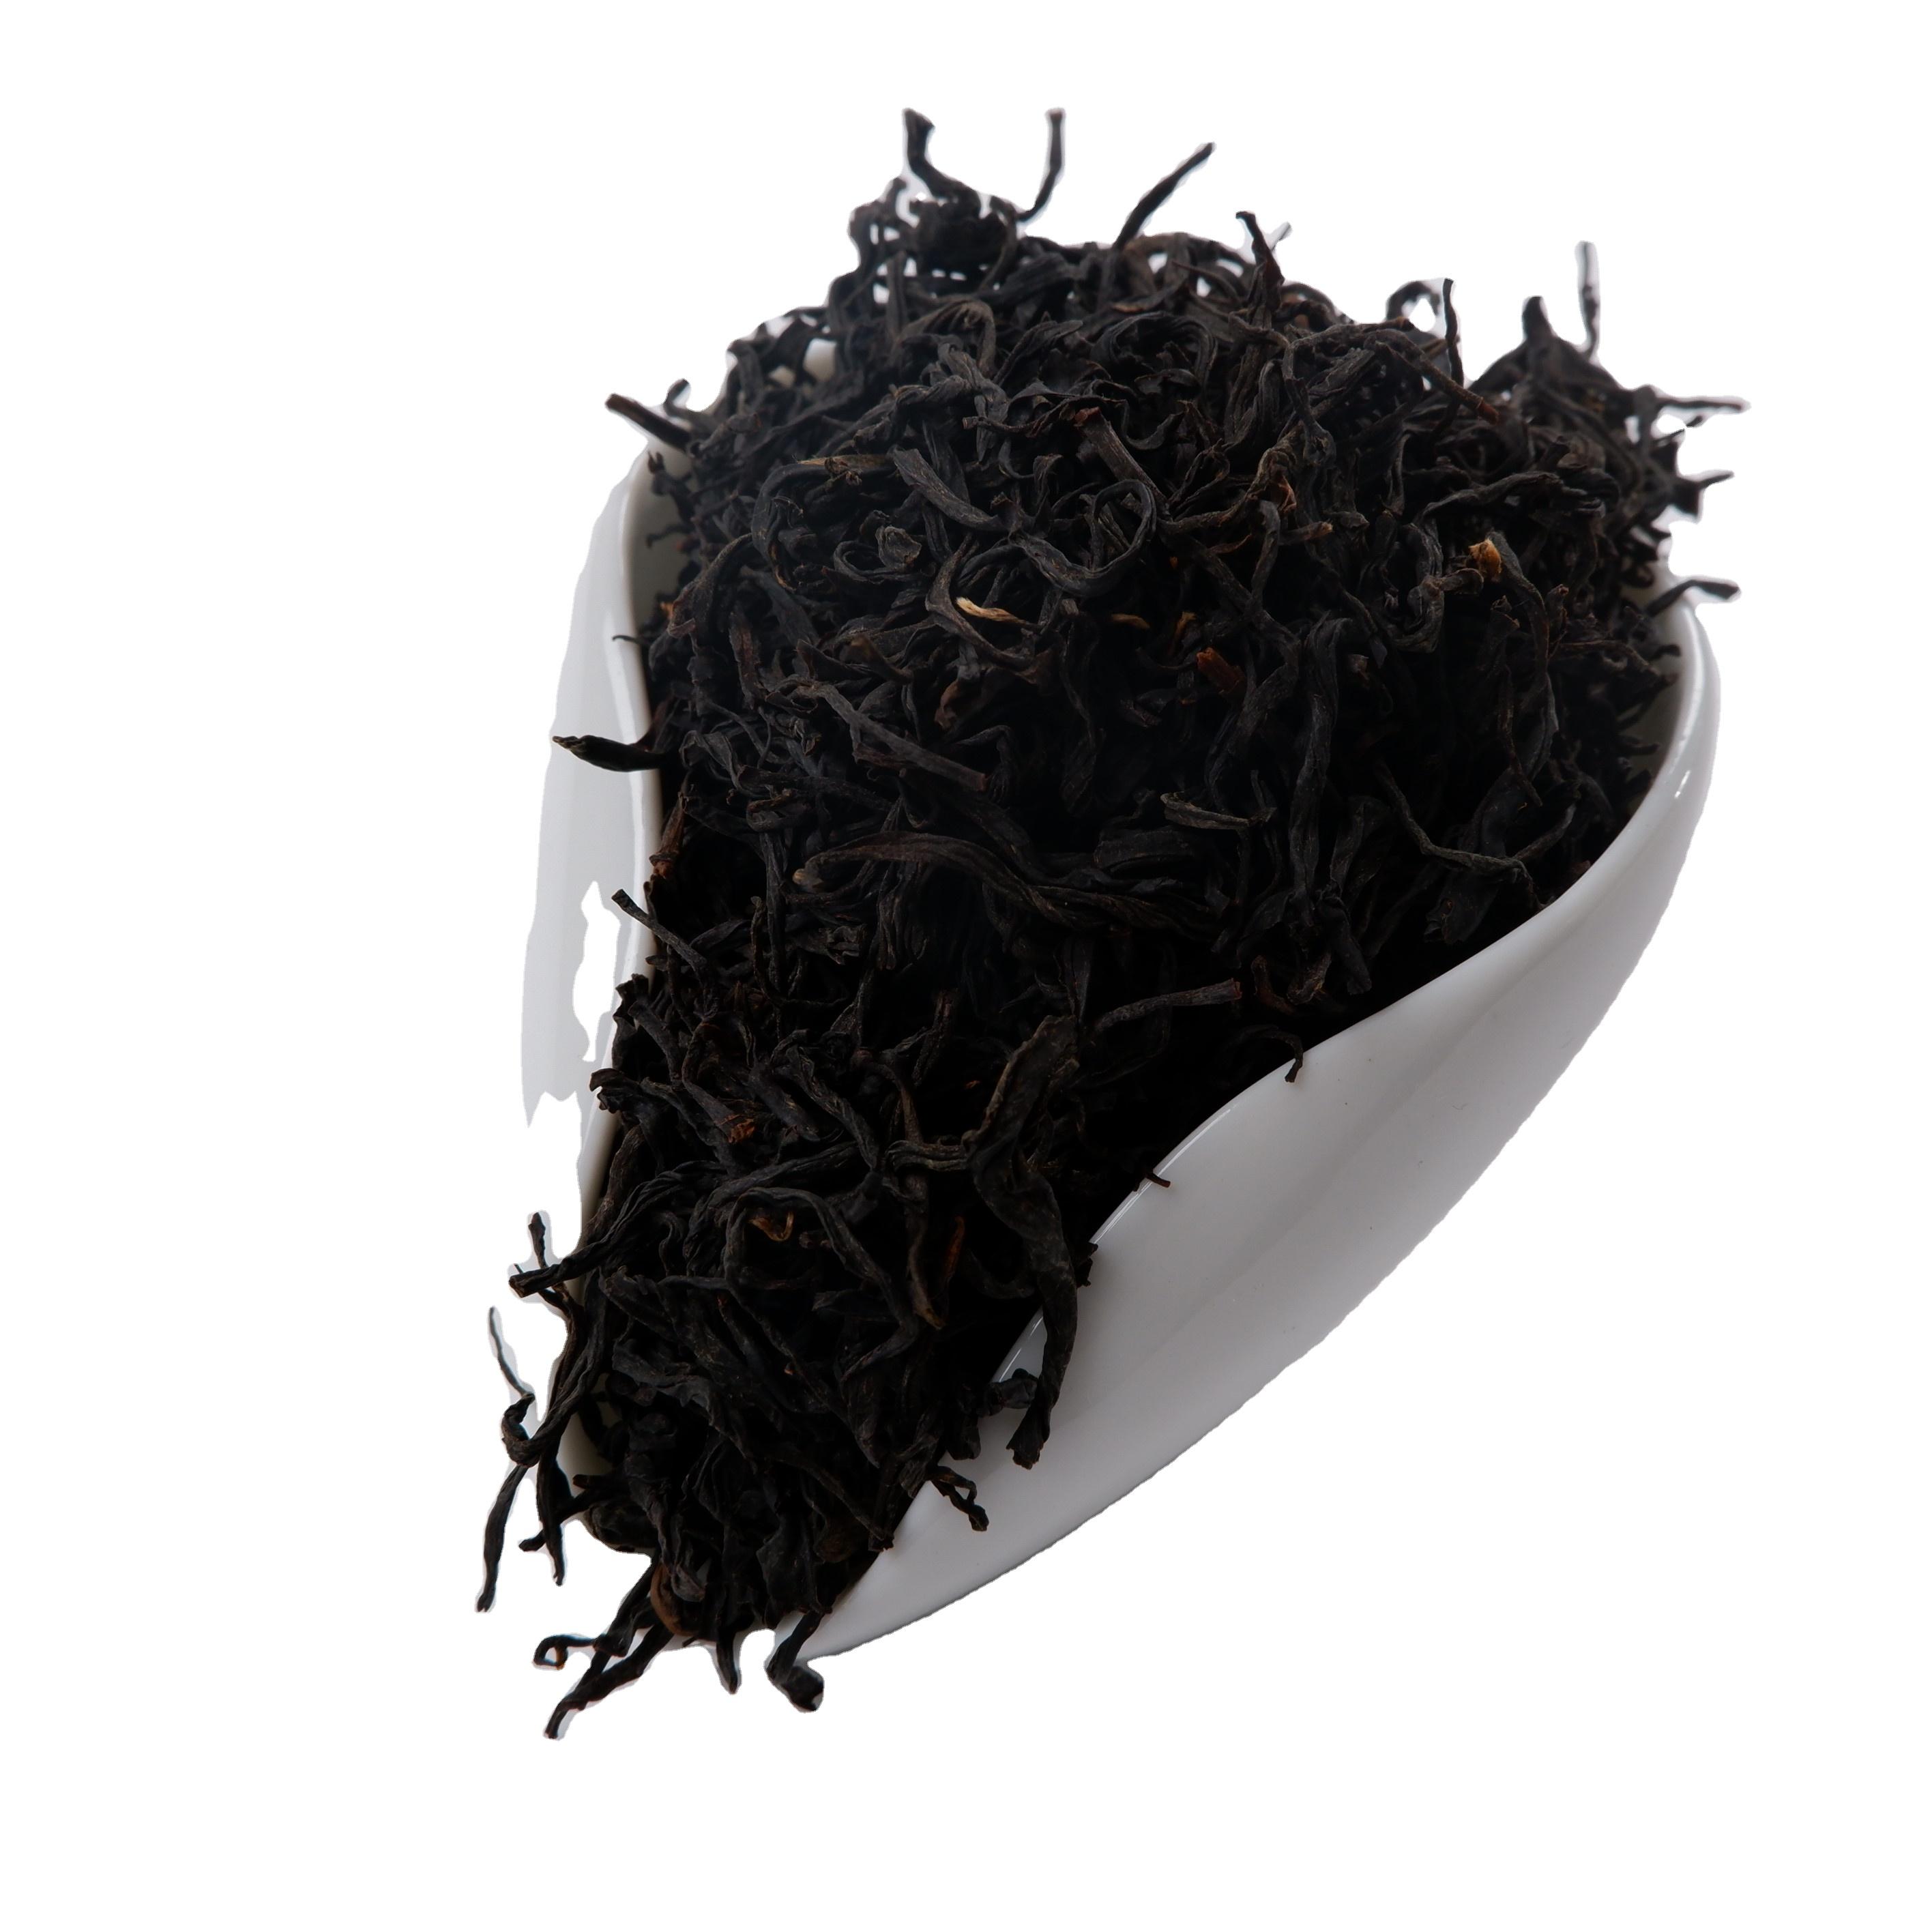 Superfine Black Tea Slimming Tea with Professional Manufacture Model HC01 - 4uTea   4uTea.com